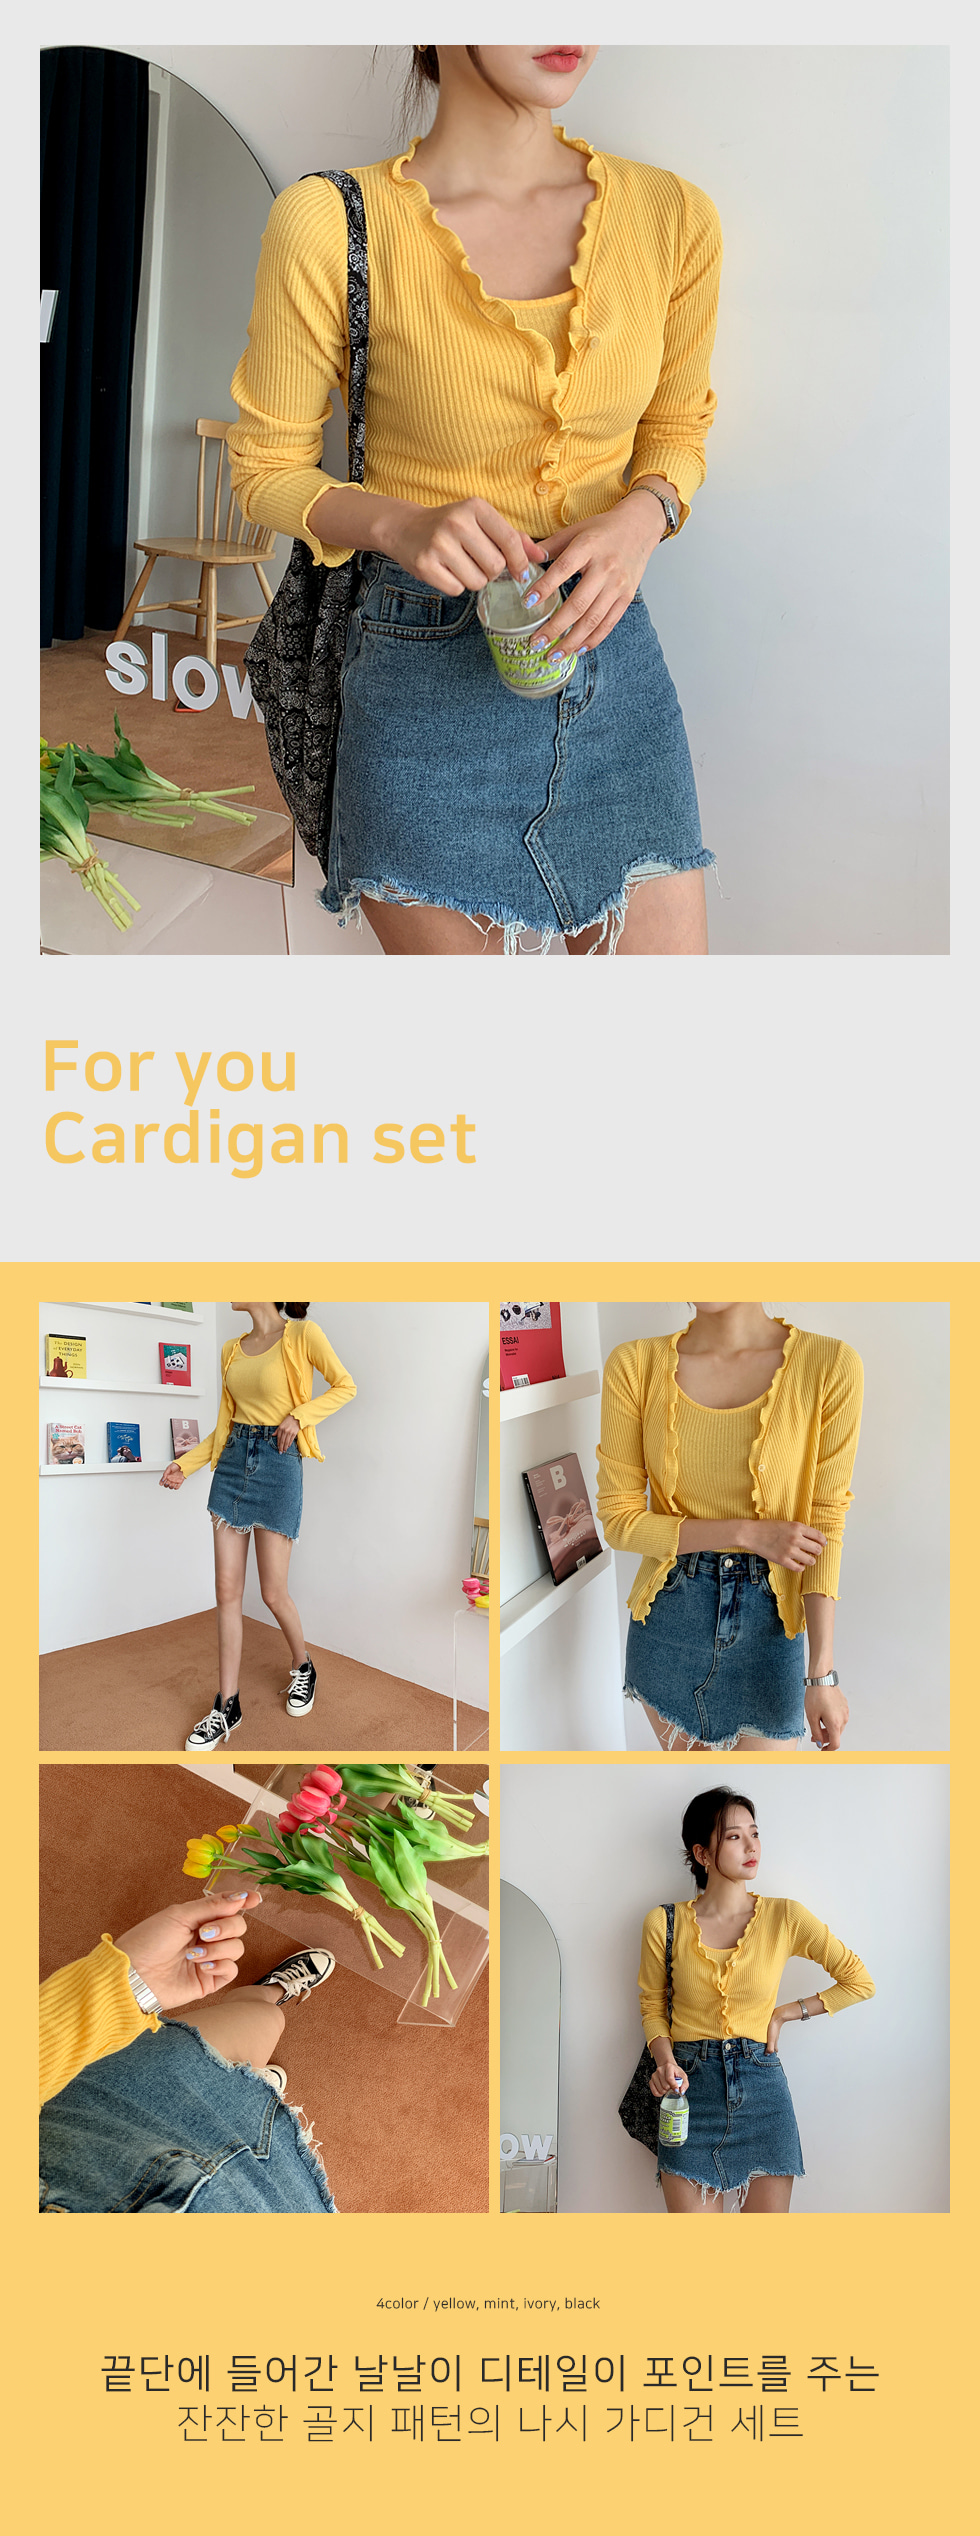 Breast Cardigan Set